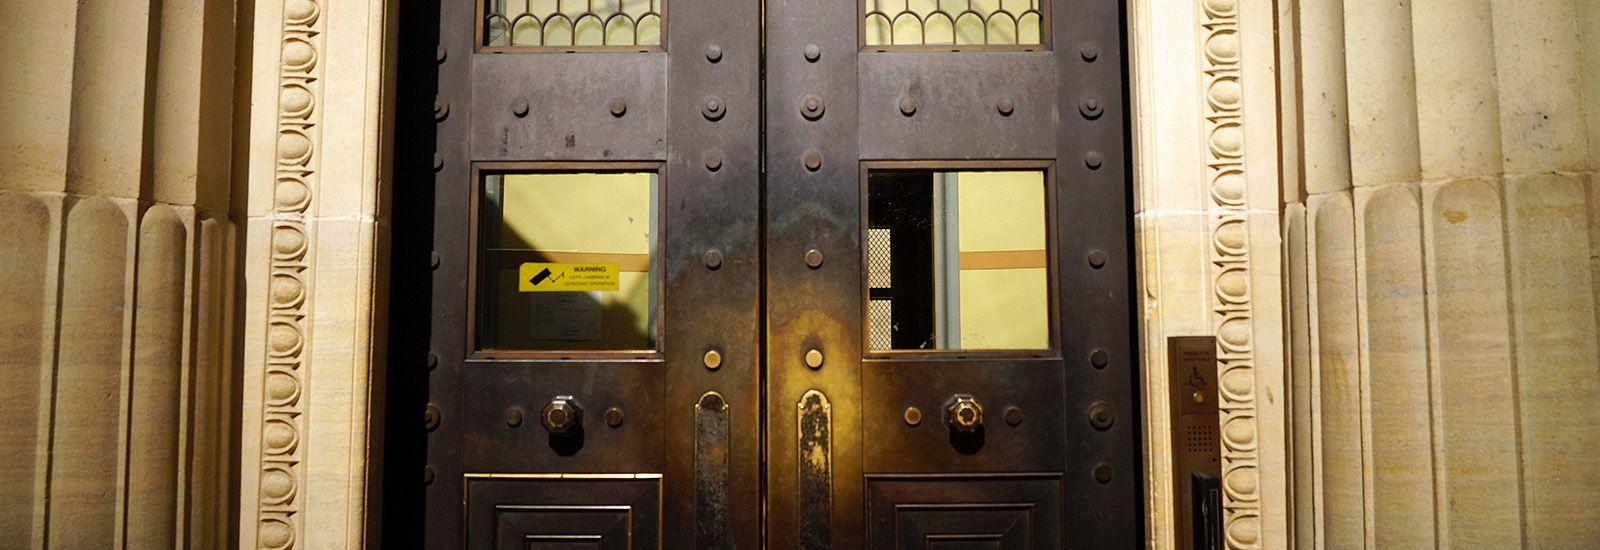 Metal doors of the Sackler Library